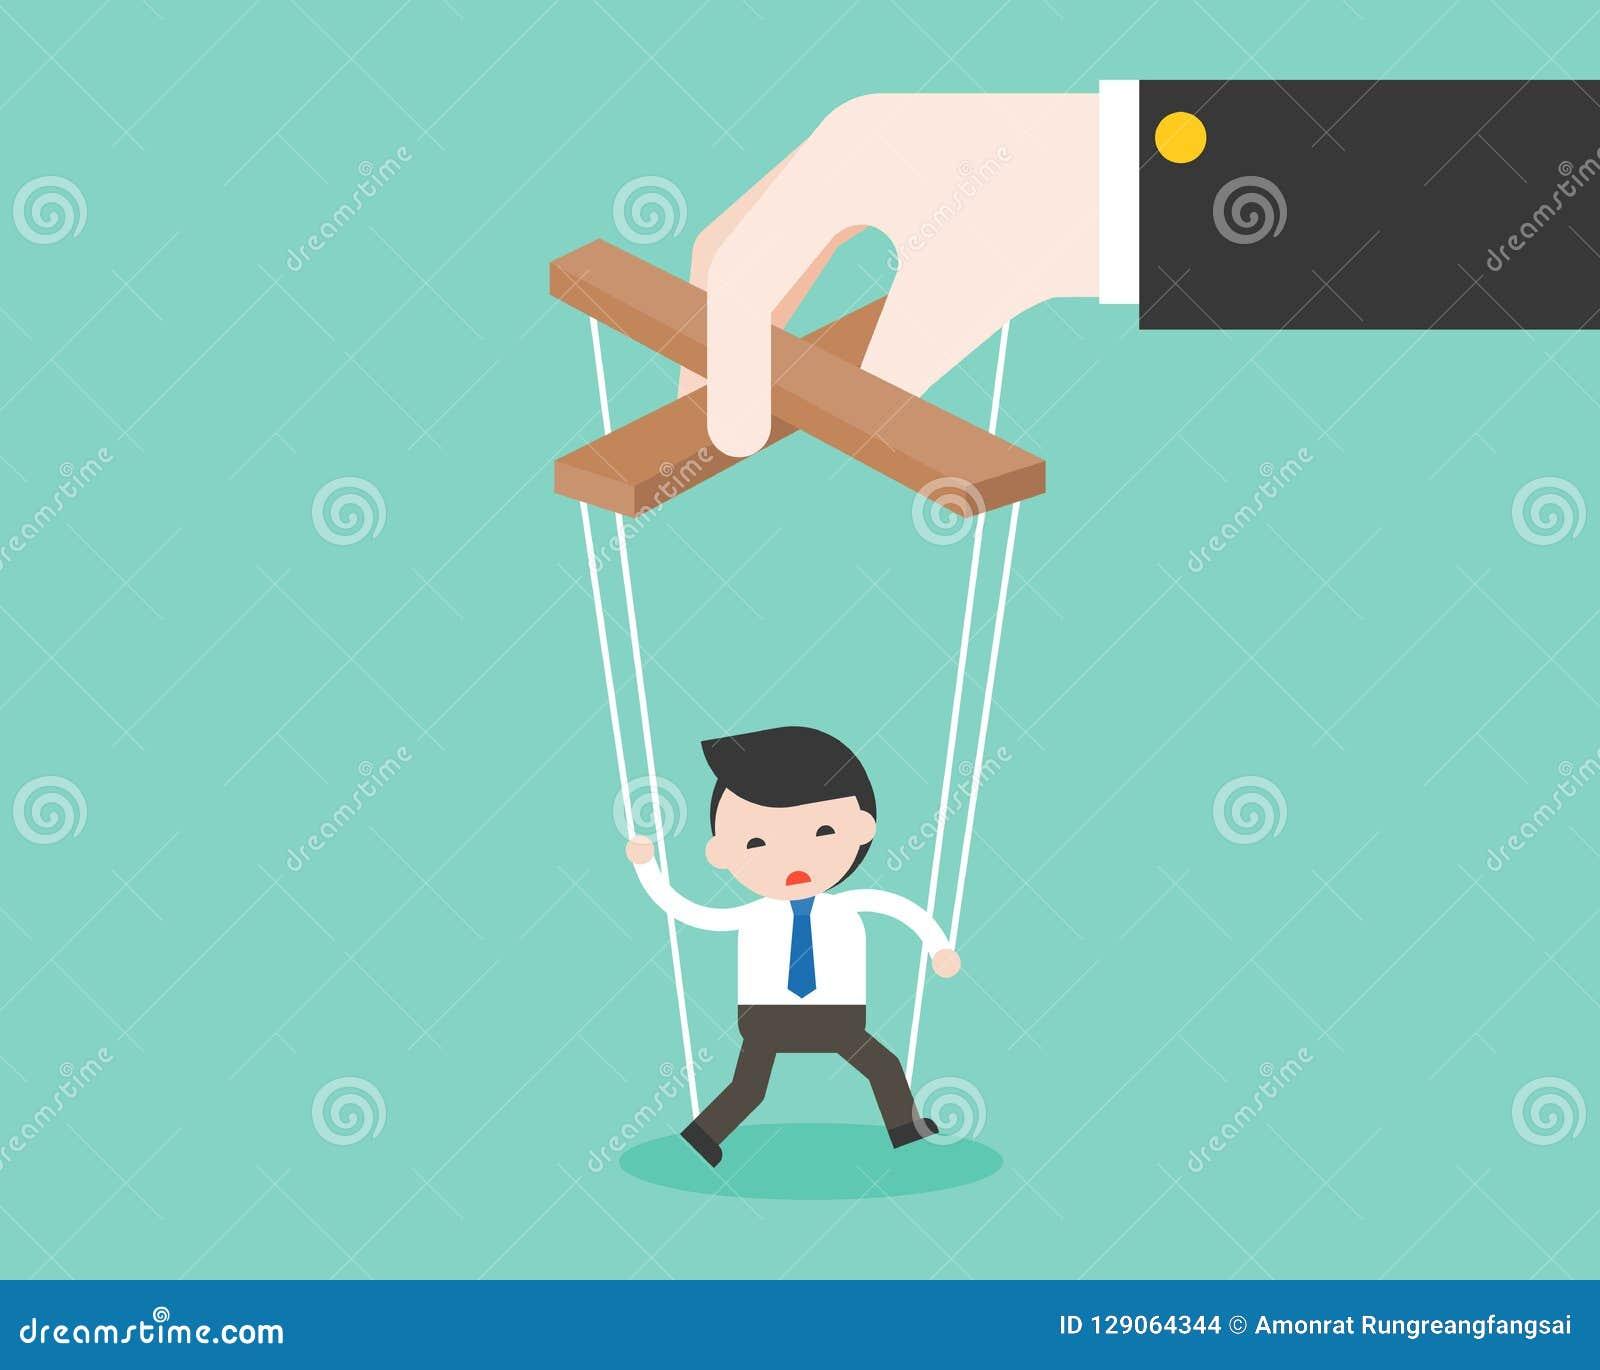 Big hand manipulate small puppet of businessman